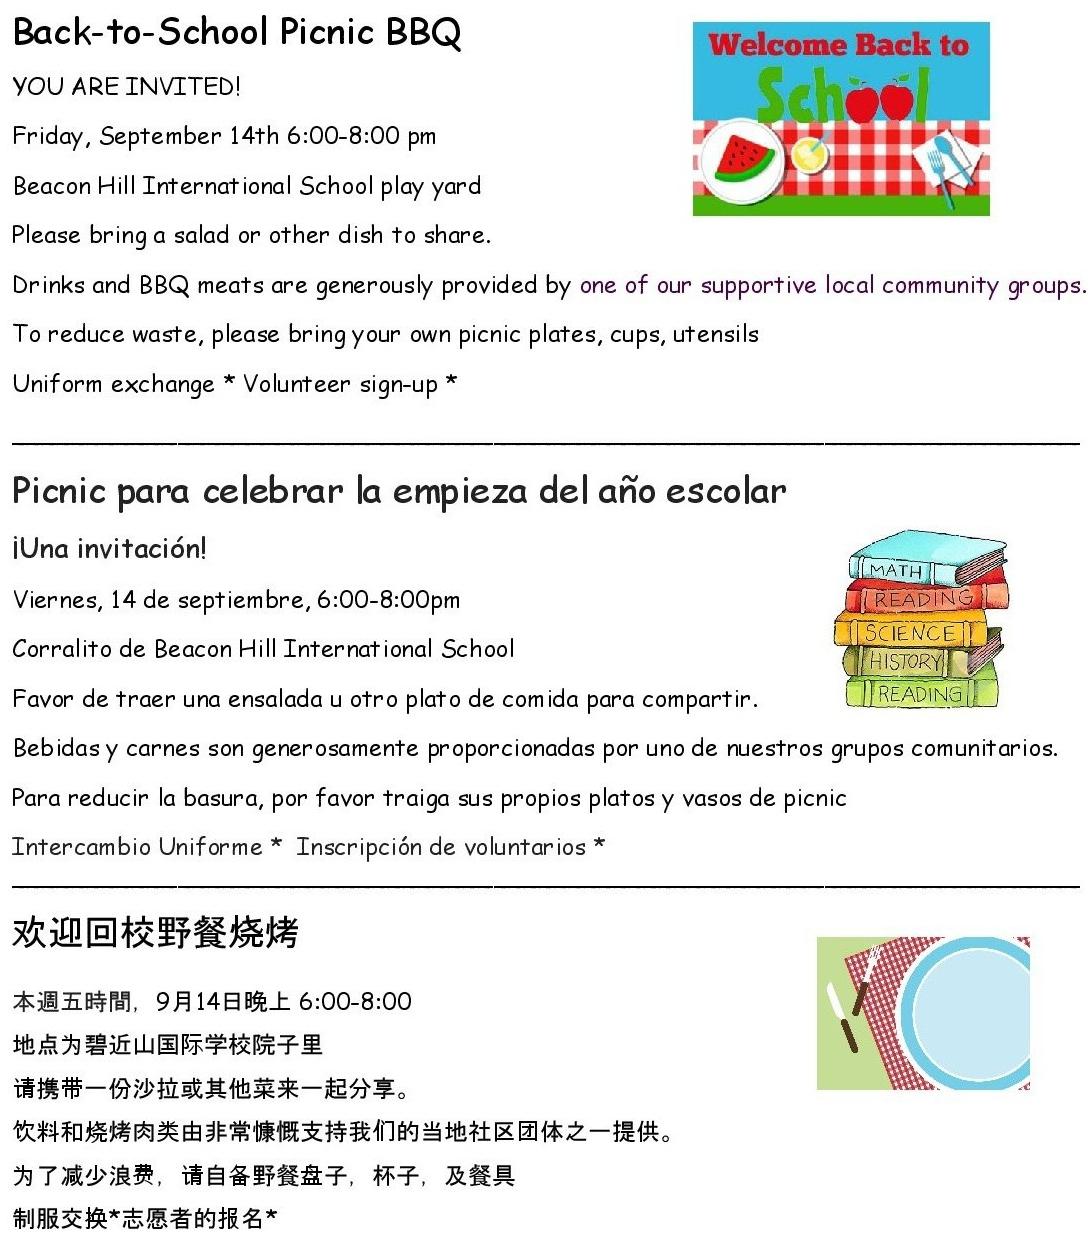 back-to-school-picnic-001-e1536640150652.jpg